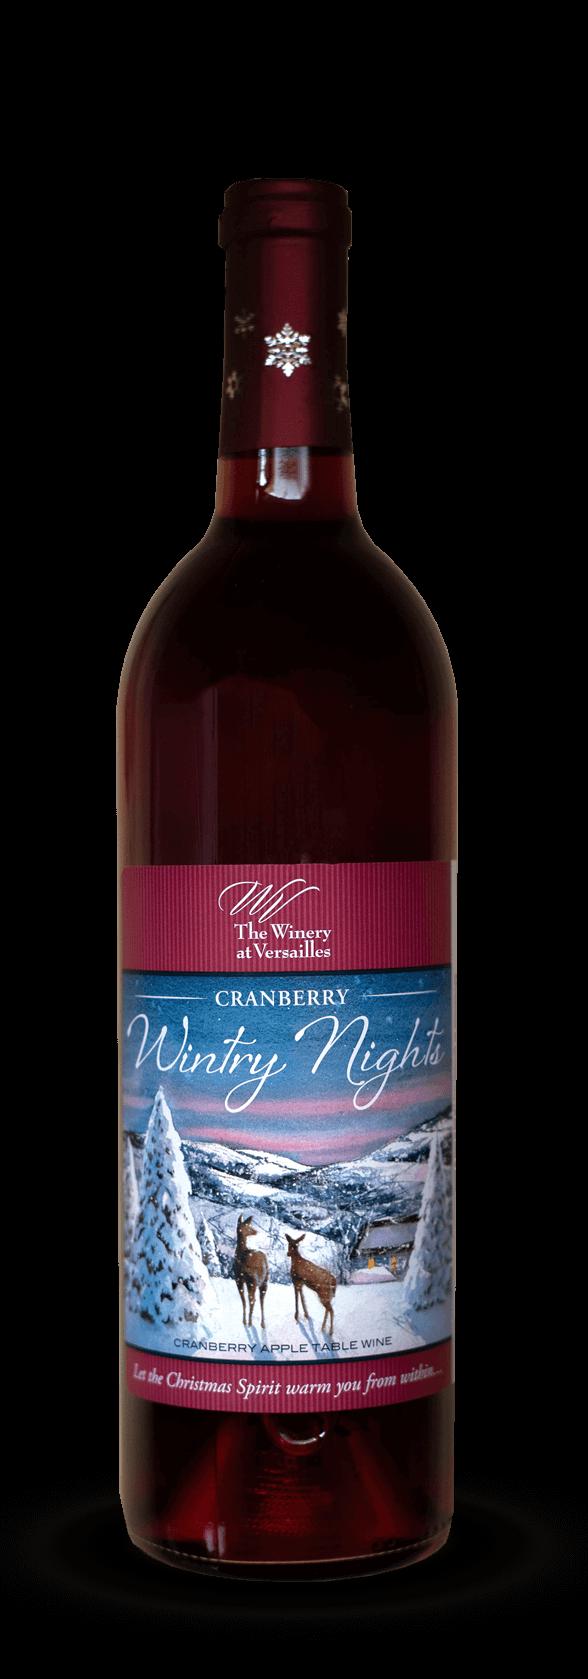 Cranberry Wintry Nights